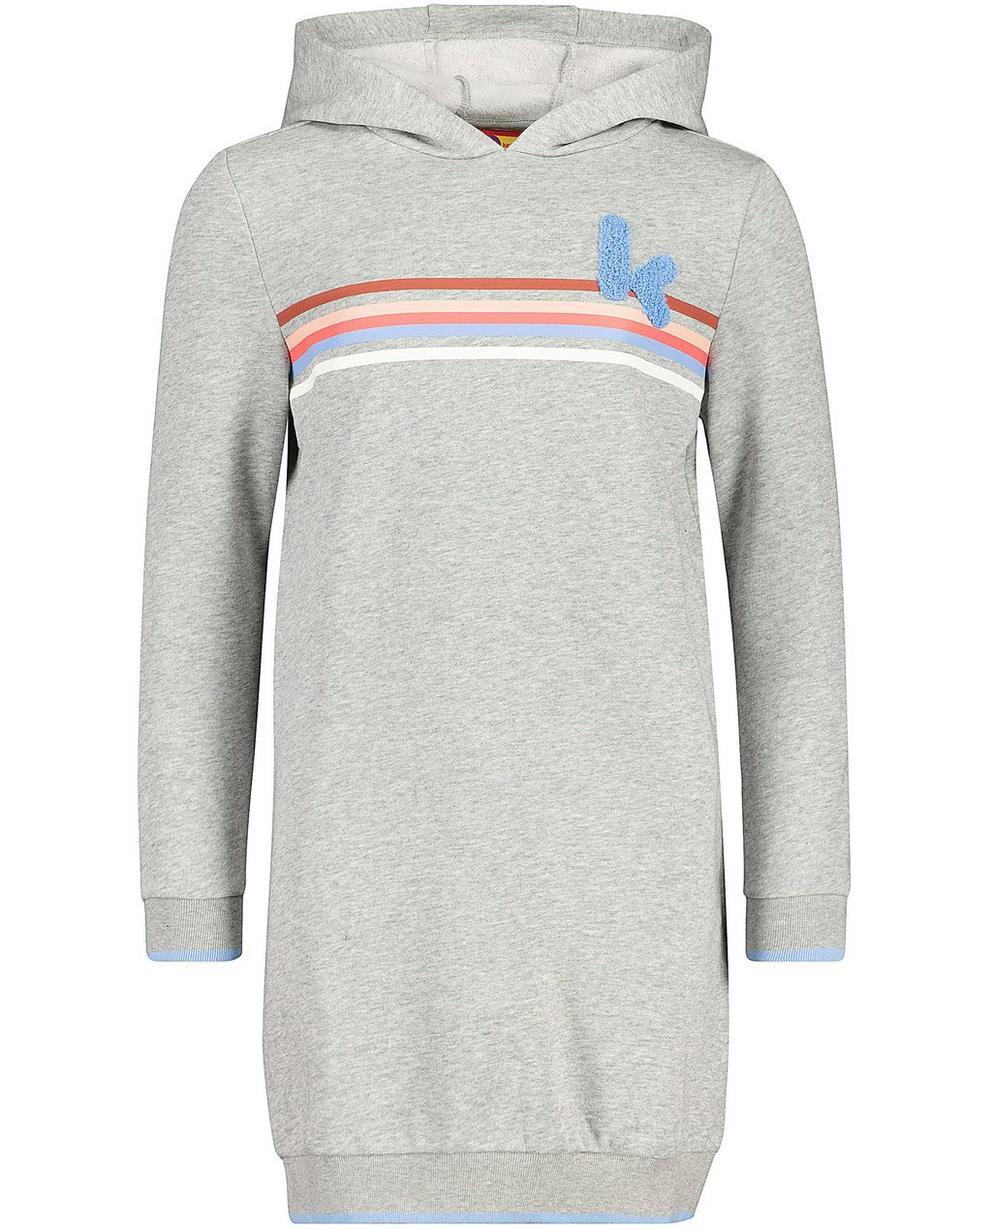 Kleider - Blassgrau - Sweatkleid mit Kapuze